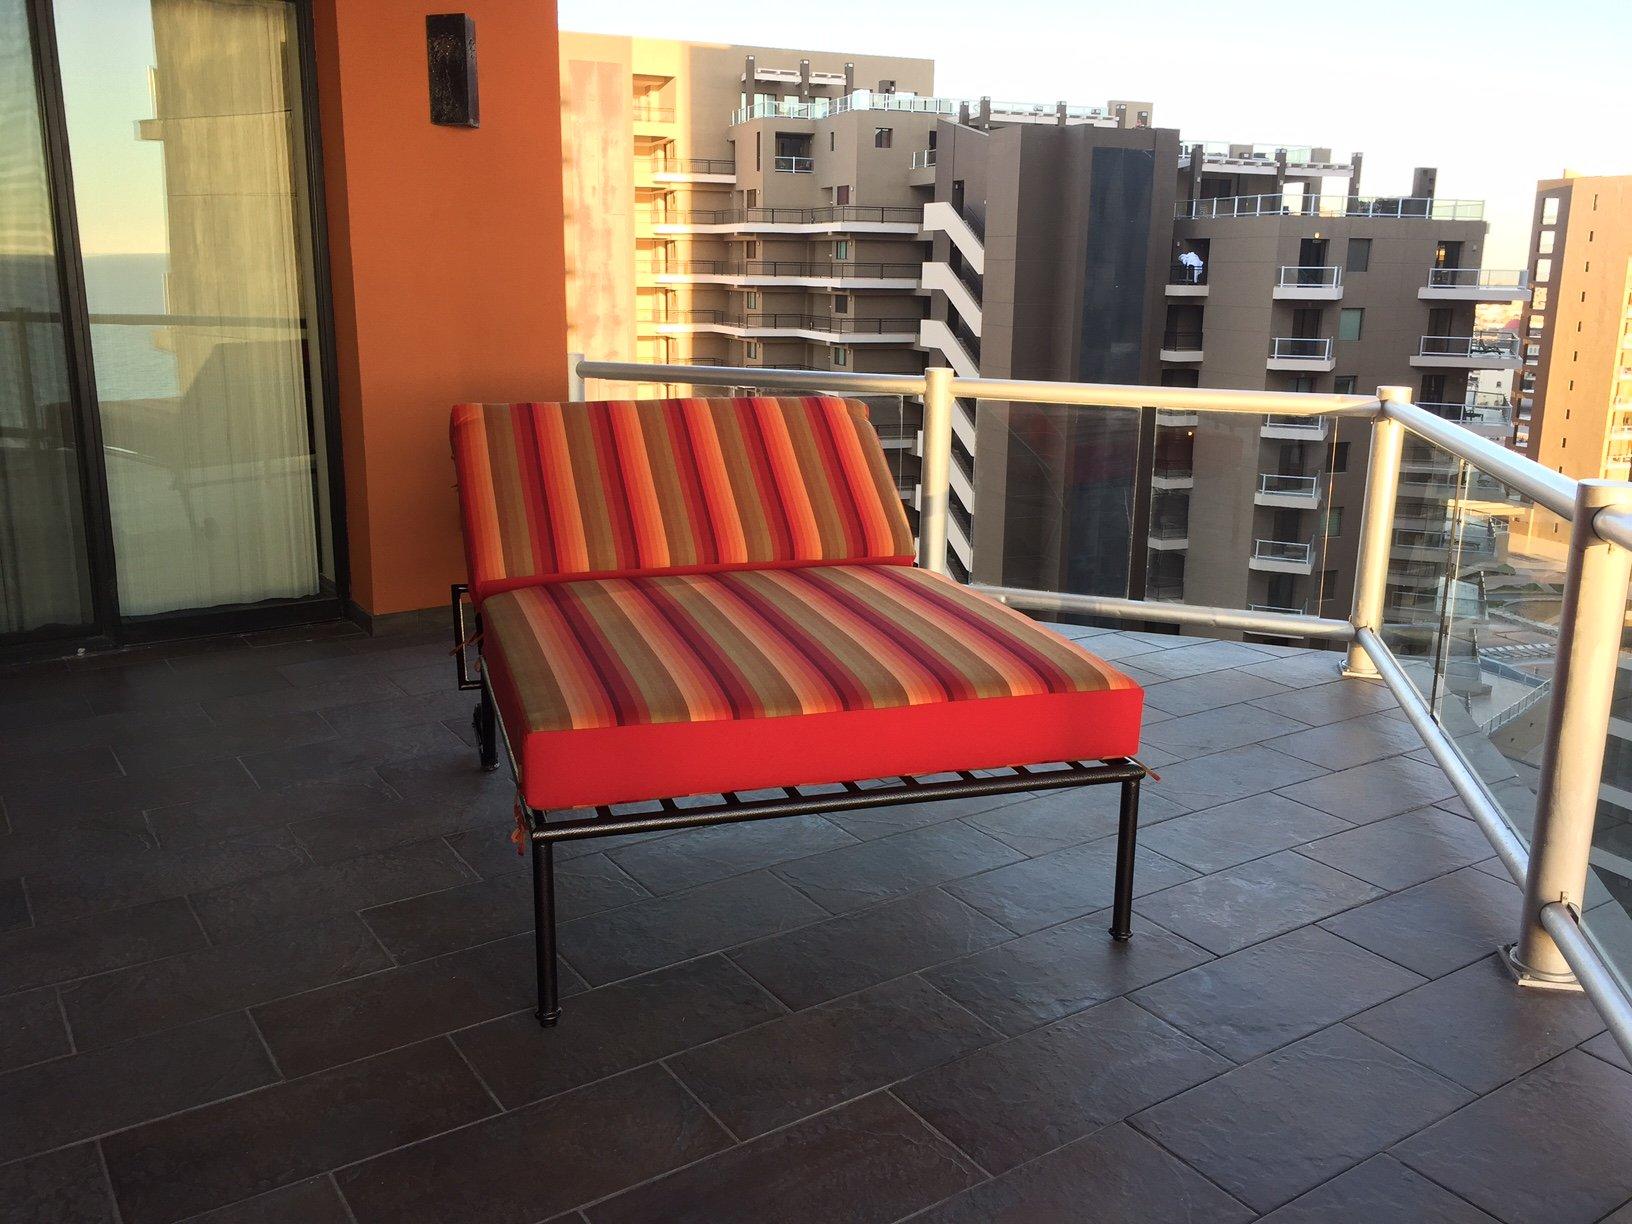 Molino Patio Furniture image 1